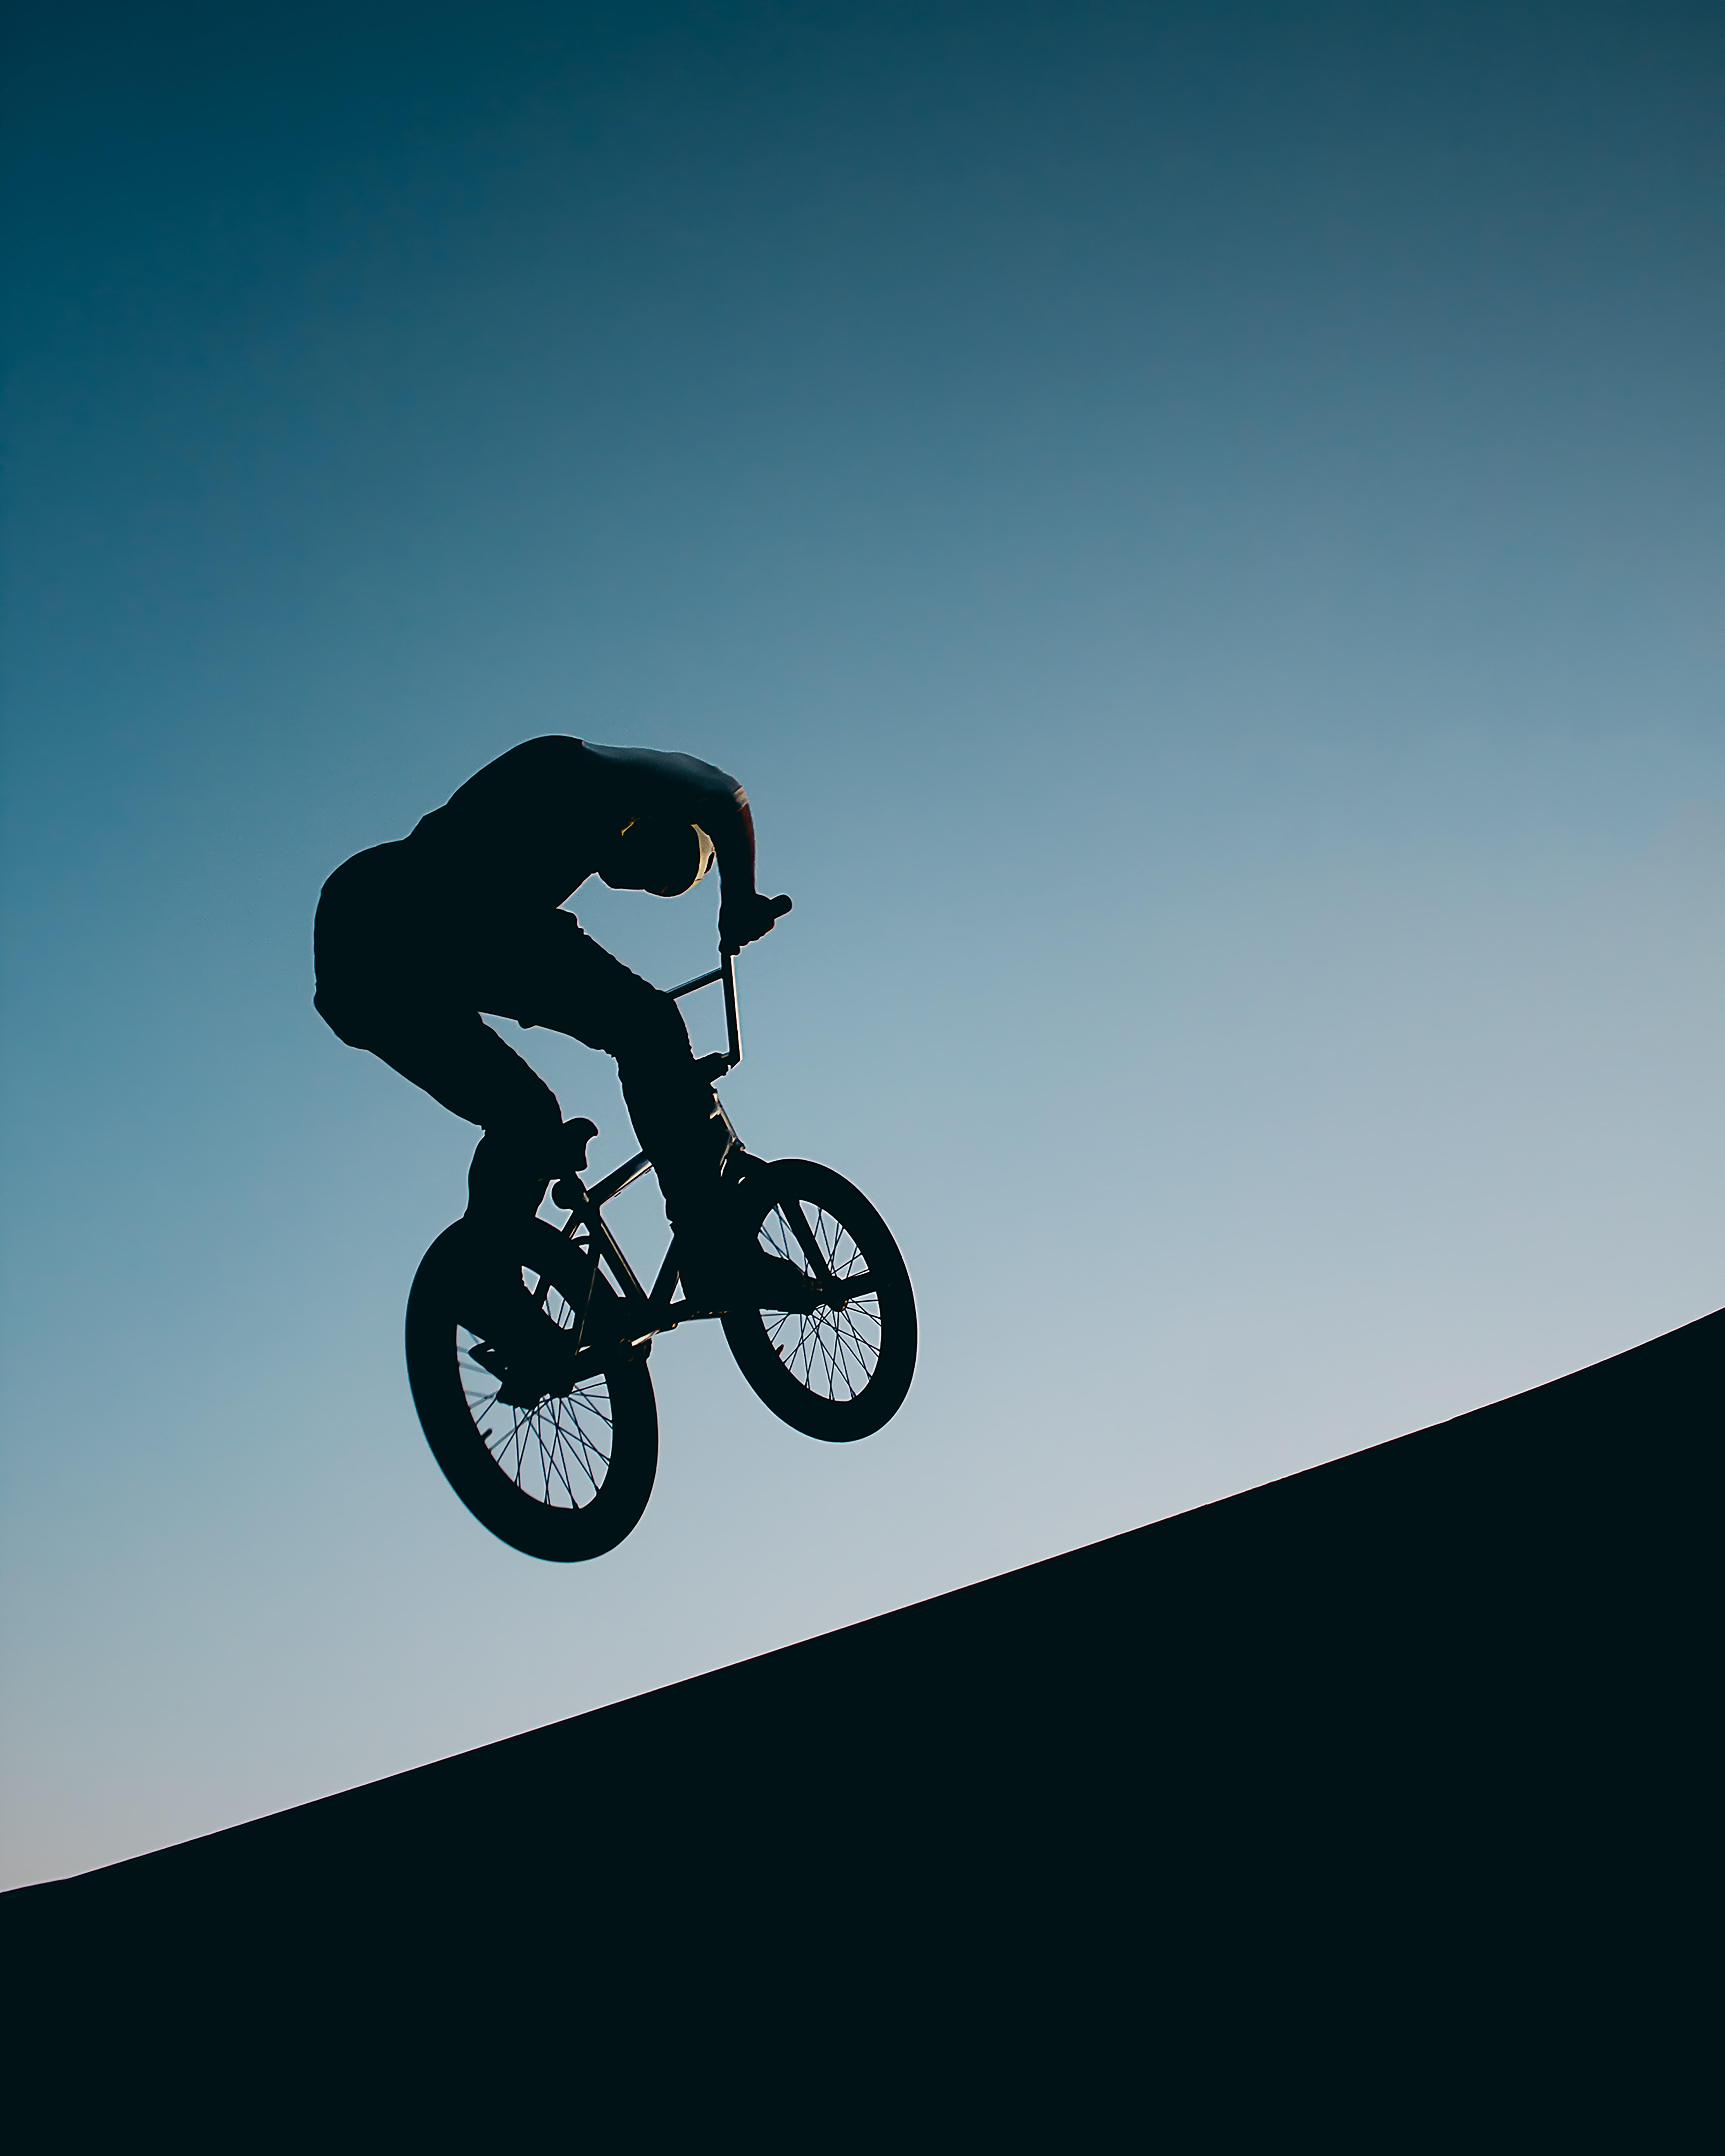 Man jumping on a bike.